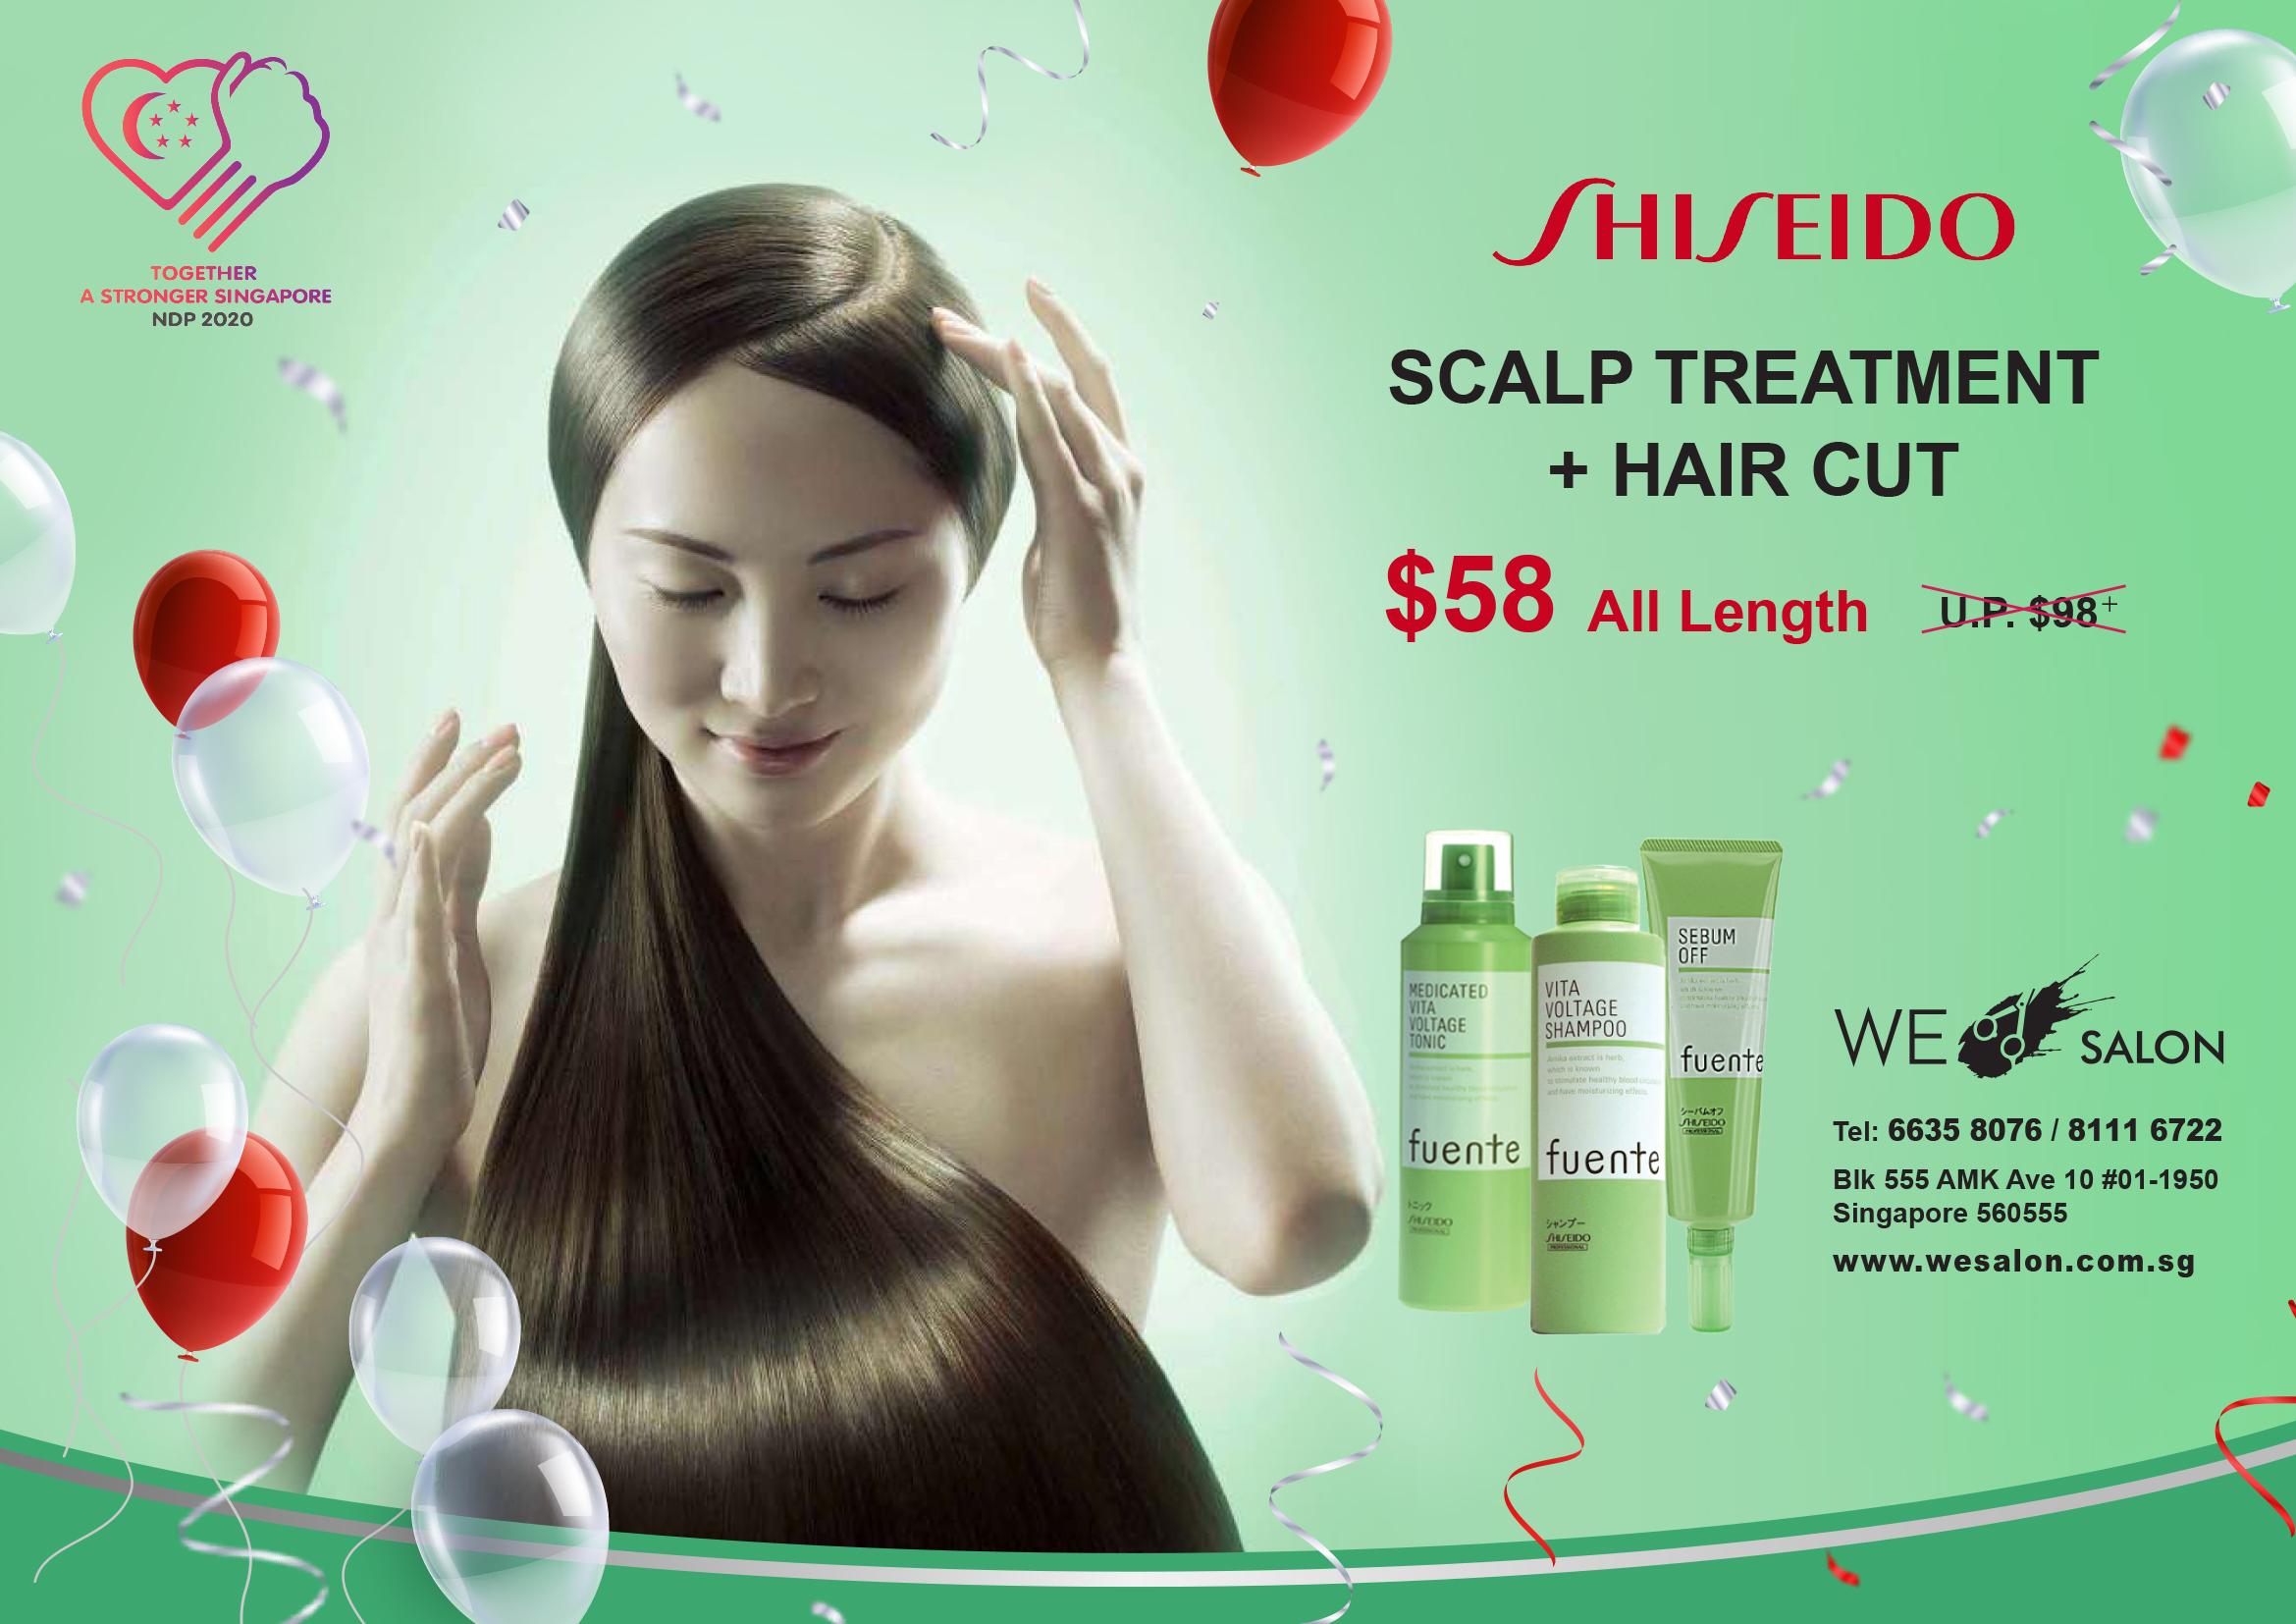 Shiseido-Scalp-Treatment = $58